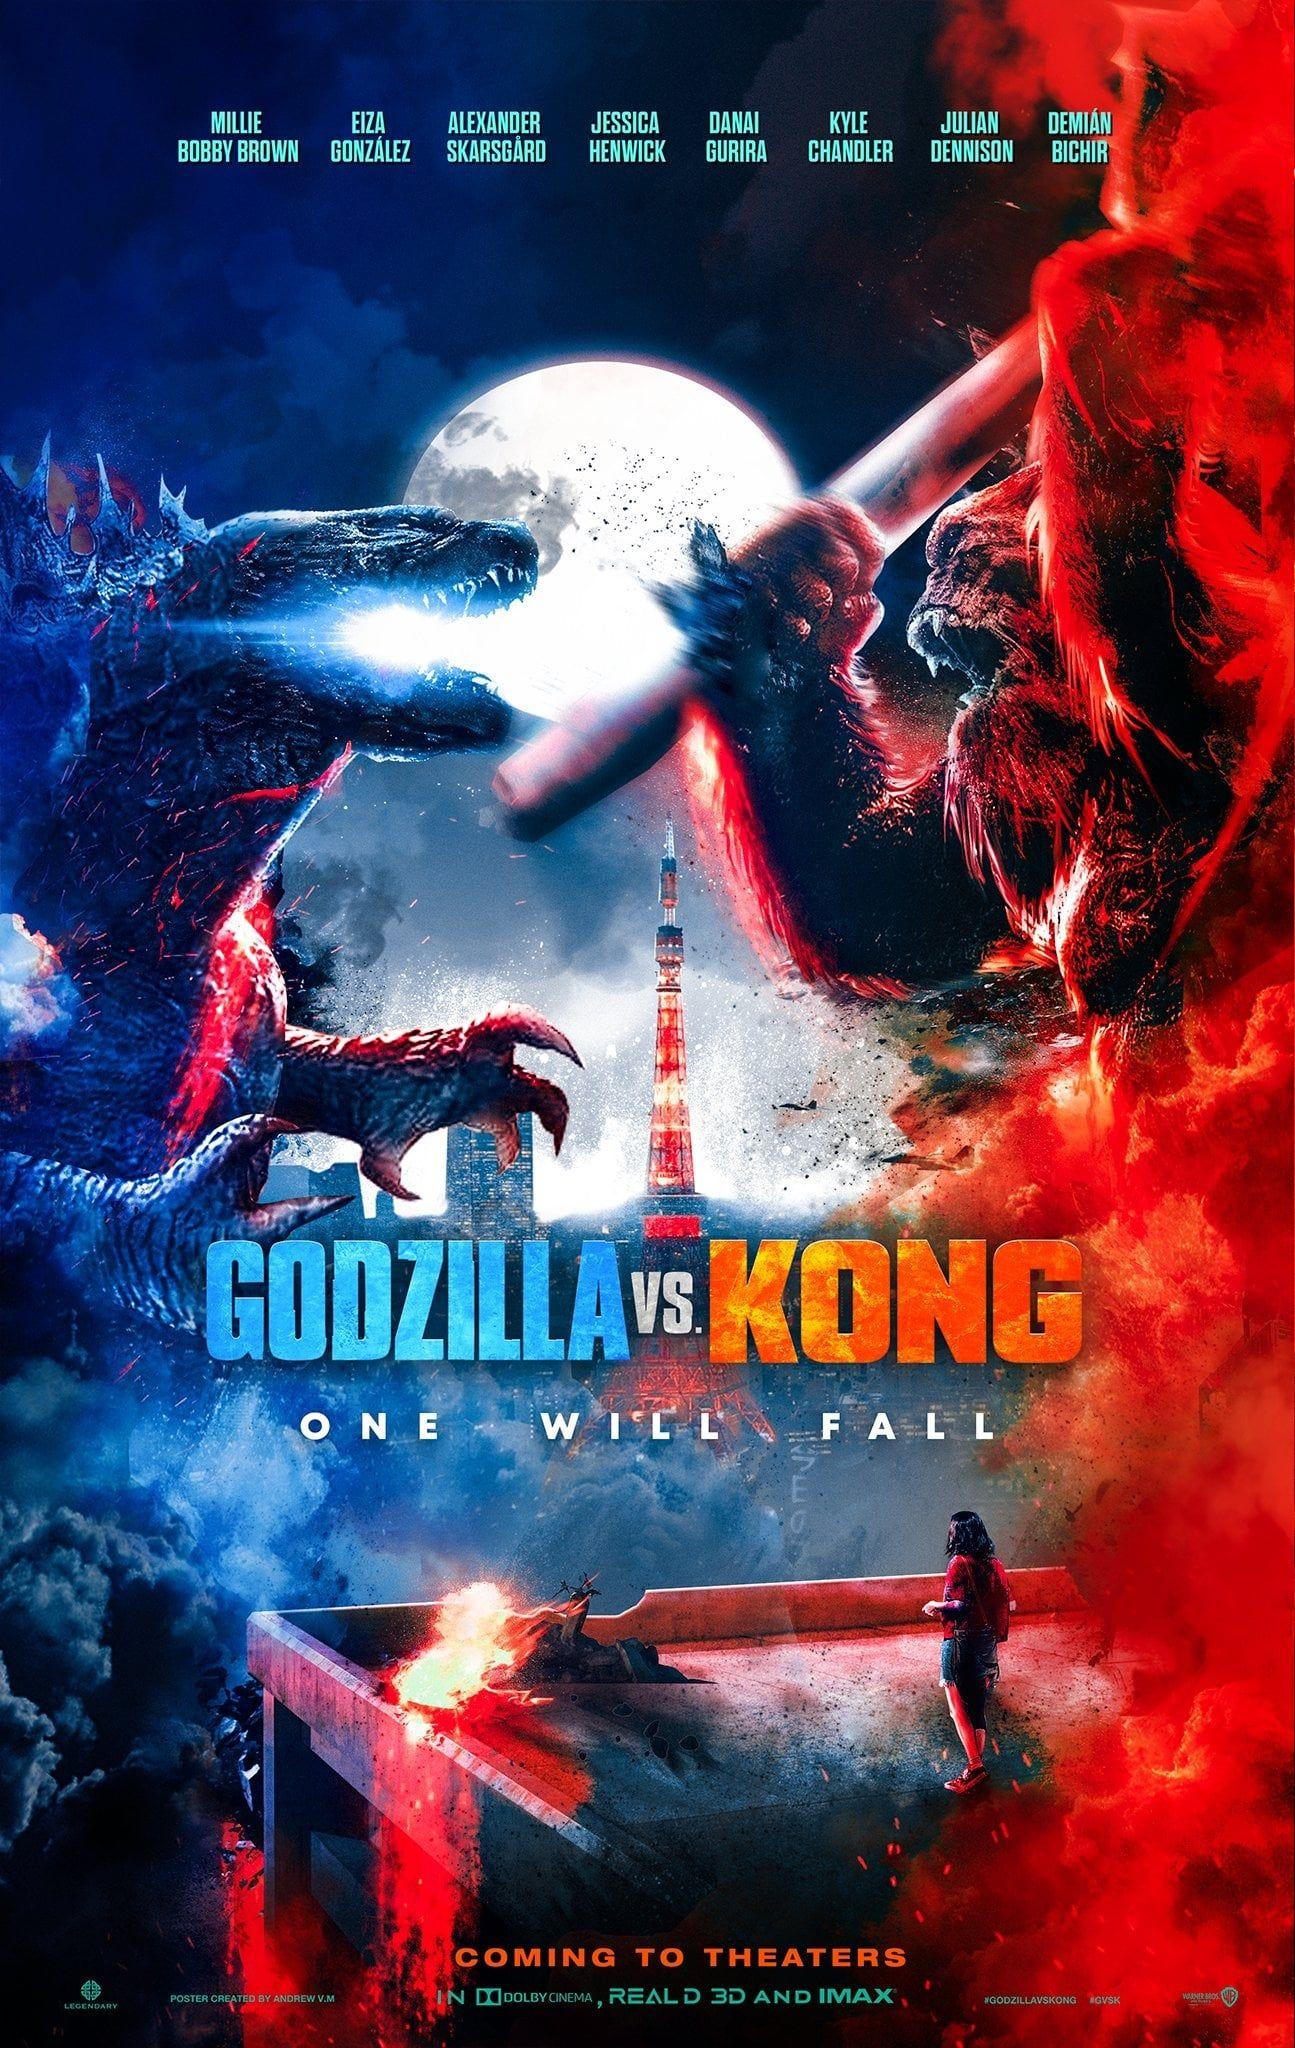 Godzilla Vs Kong Pelicula Completa En Espanol Latino Repelis Mengagumkan